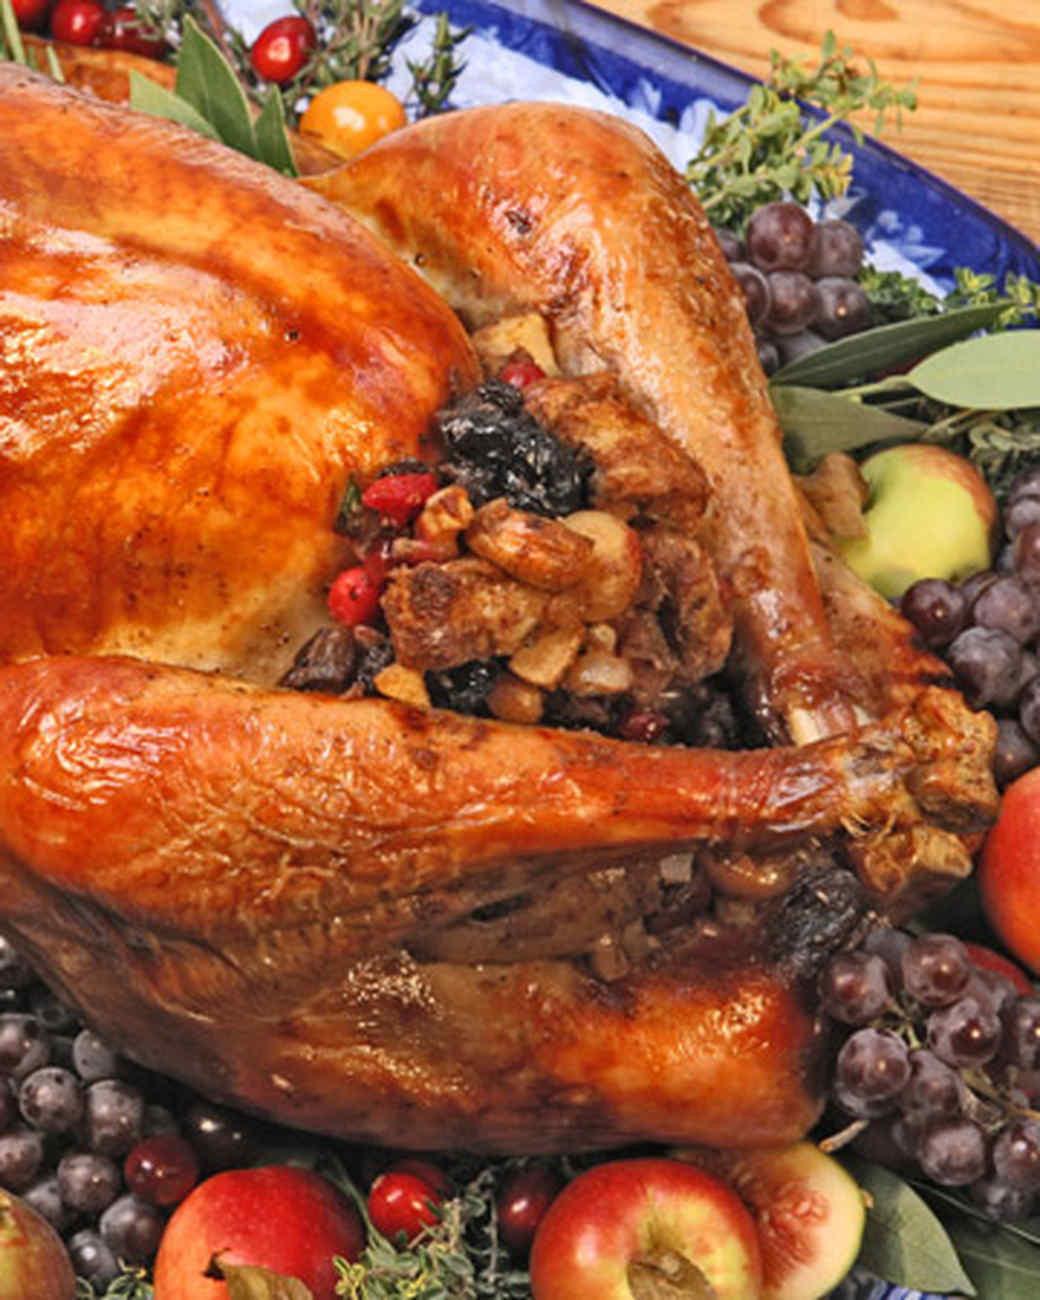 Best Turkey Recipes For Thanksgiving  38 Terrific Thanksgiving Turkey Recipes